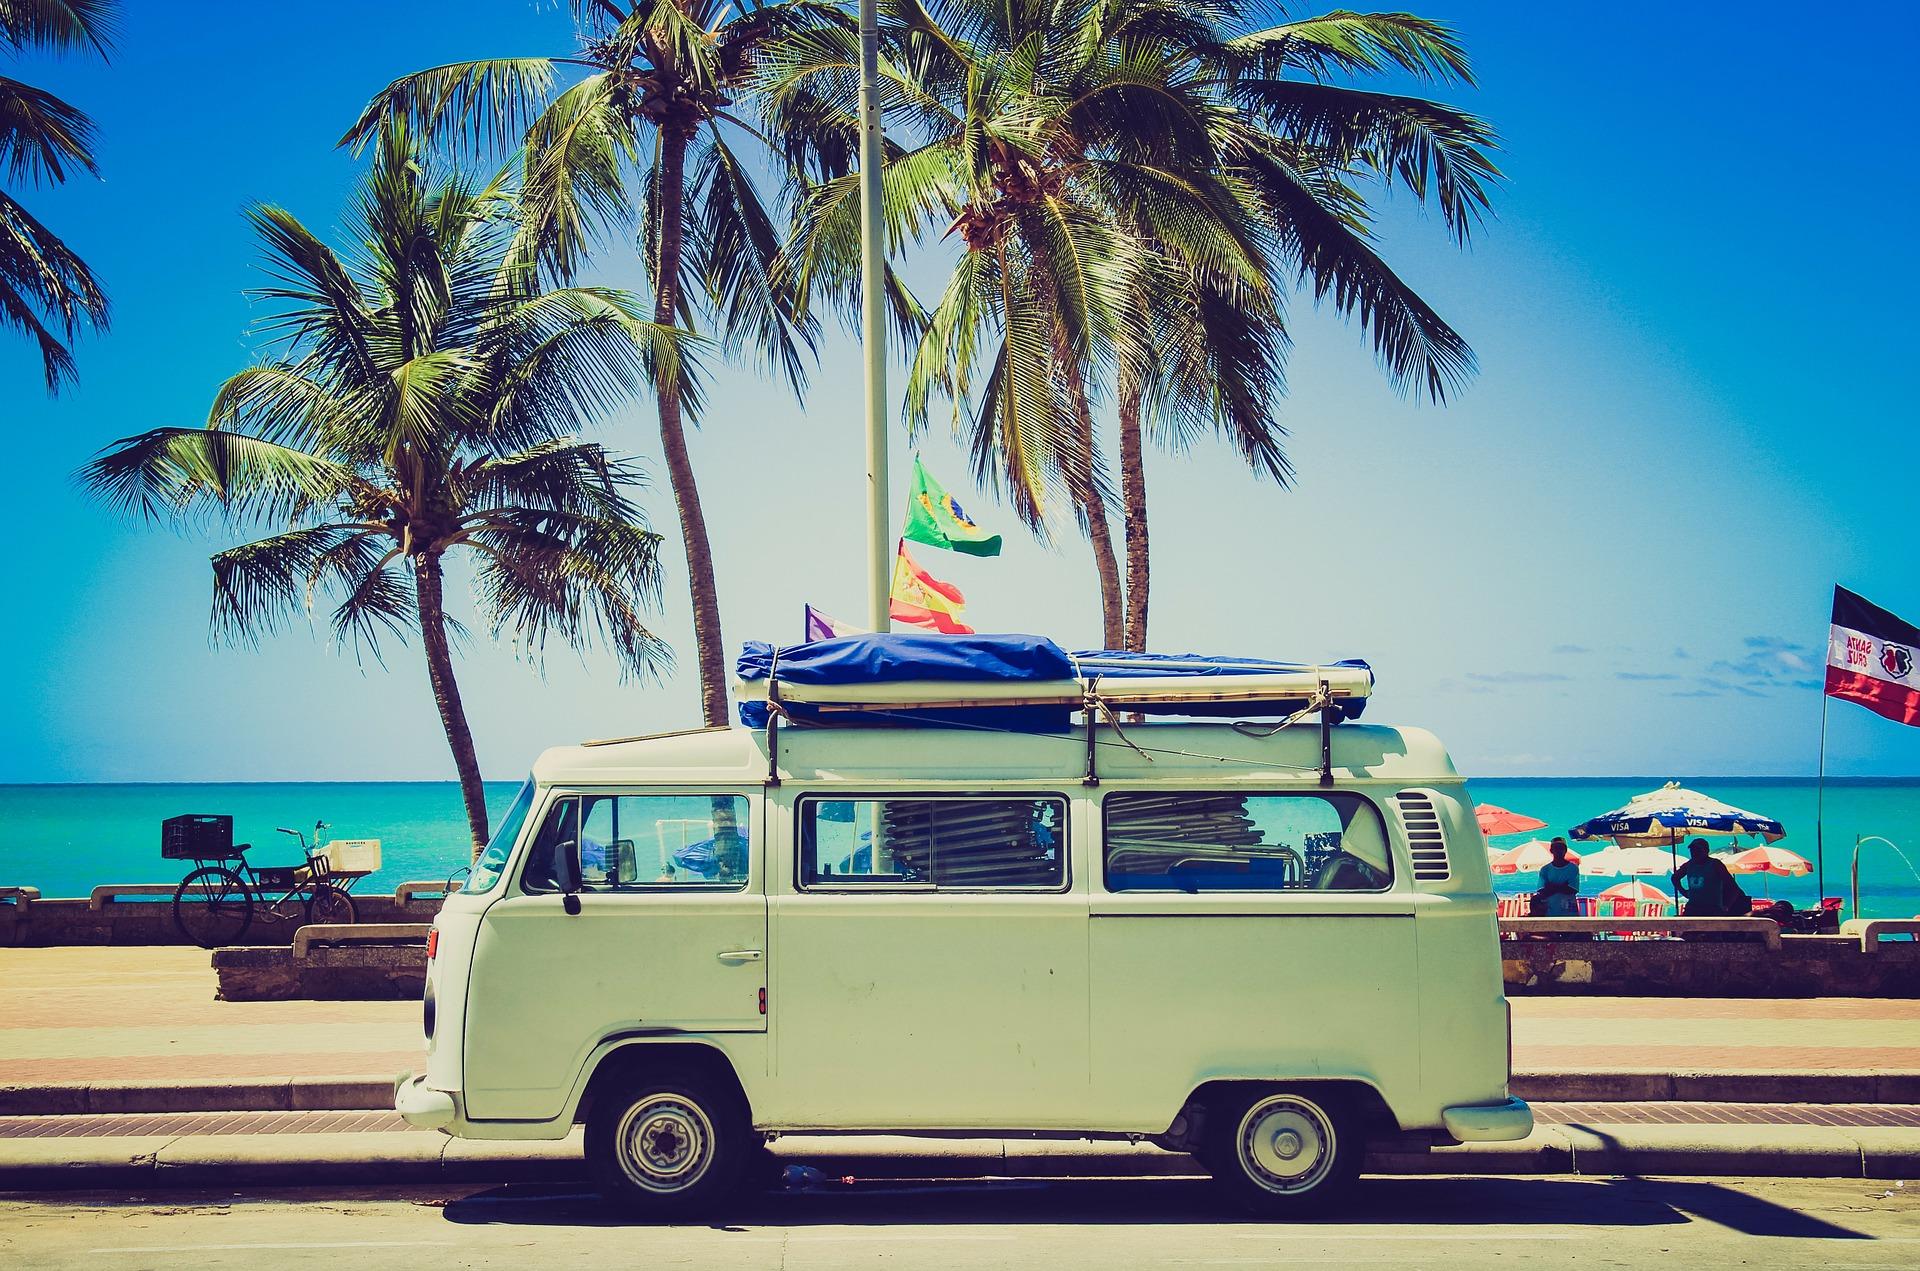 voyage instagram idées